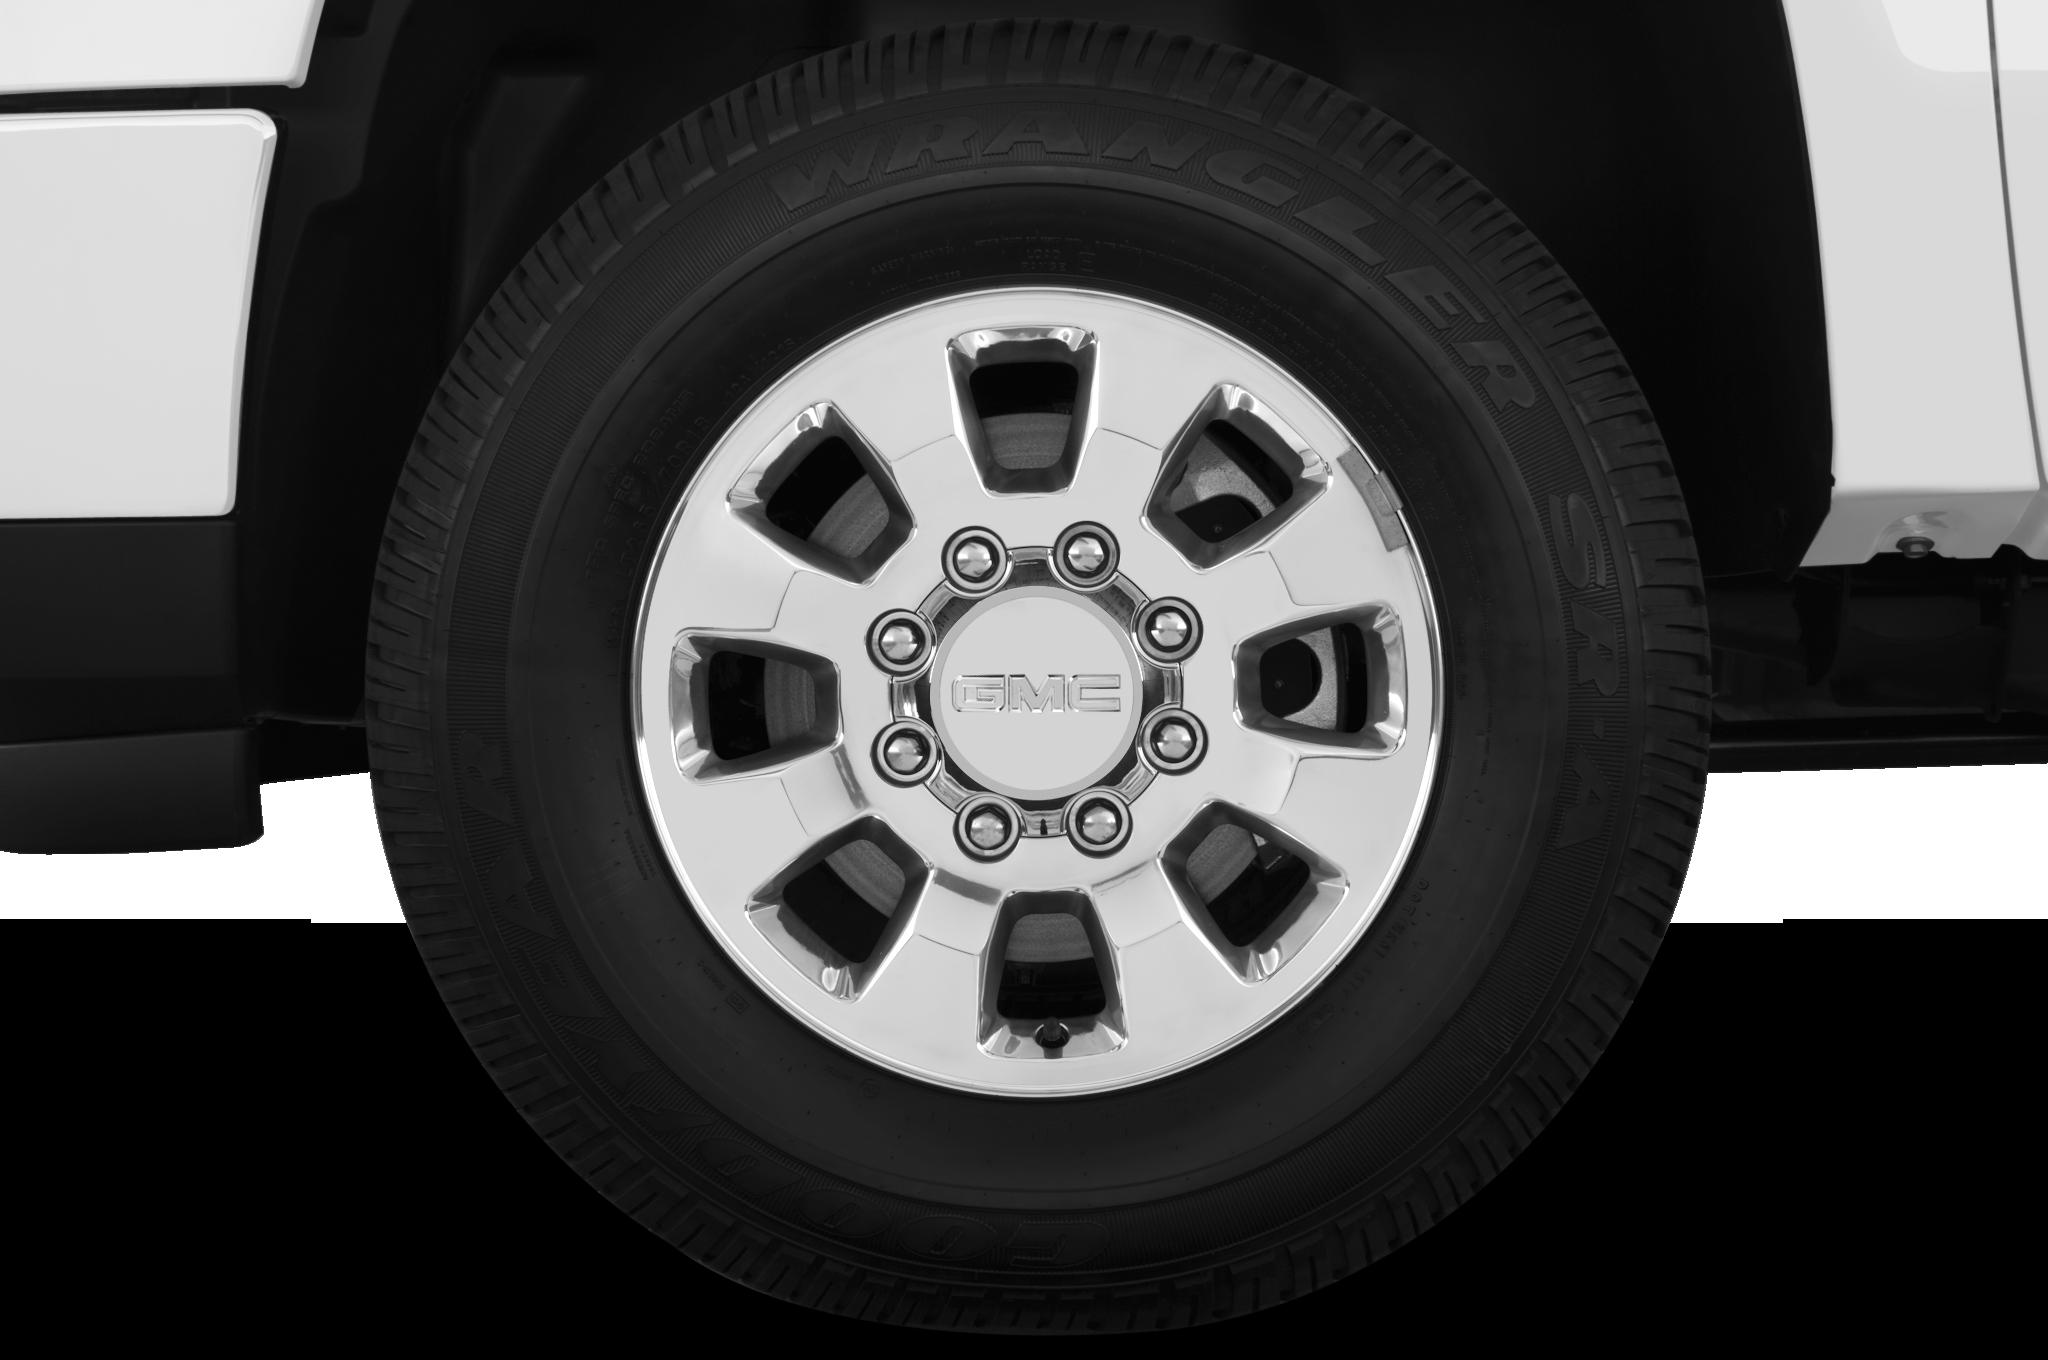 2011 Gmc Sierra 3500 Hd Crew Cab Slt 4x4 Automobile Magazine Range Rover Alternator Wiring 12 225